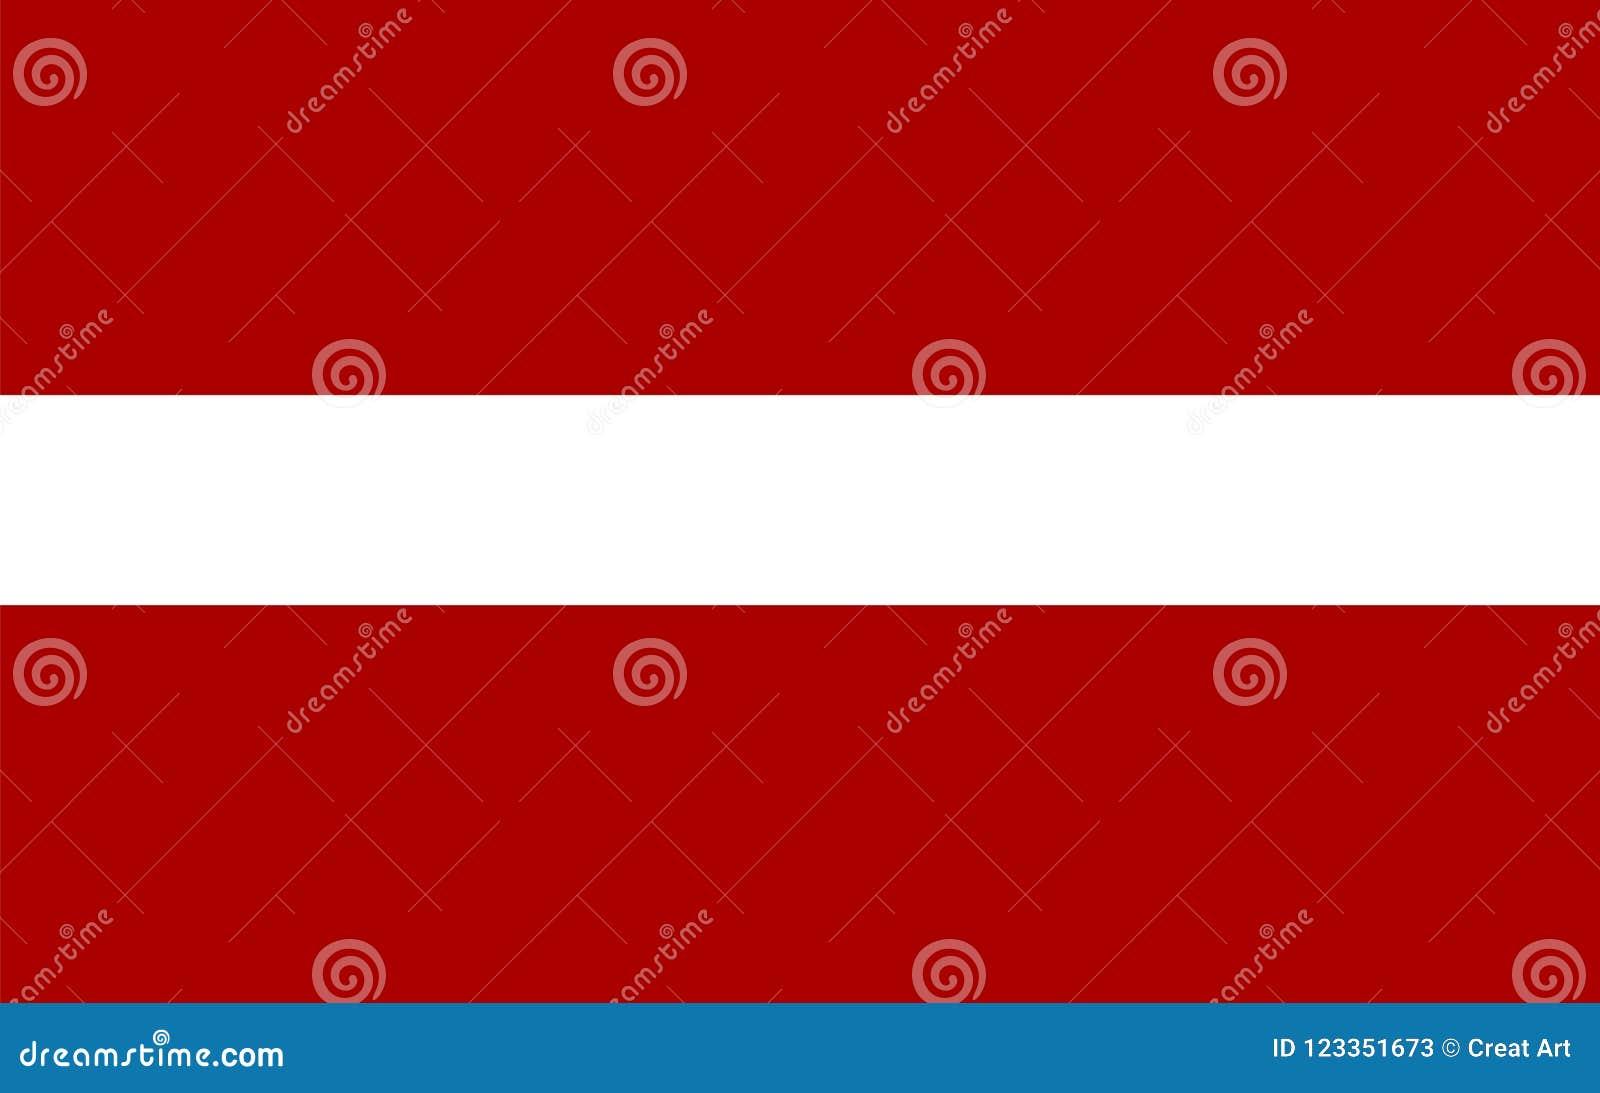 De vlagvector van Letland Illustratie van de vlag van Letland